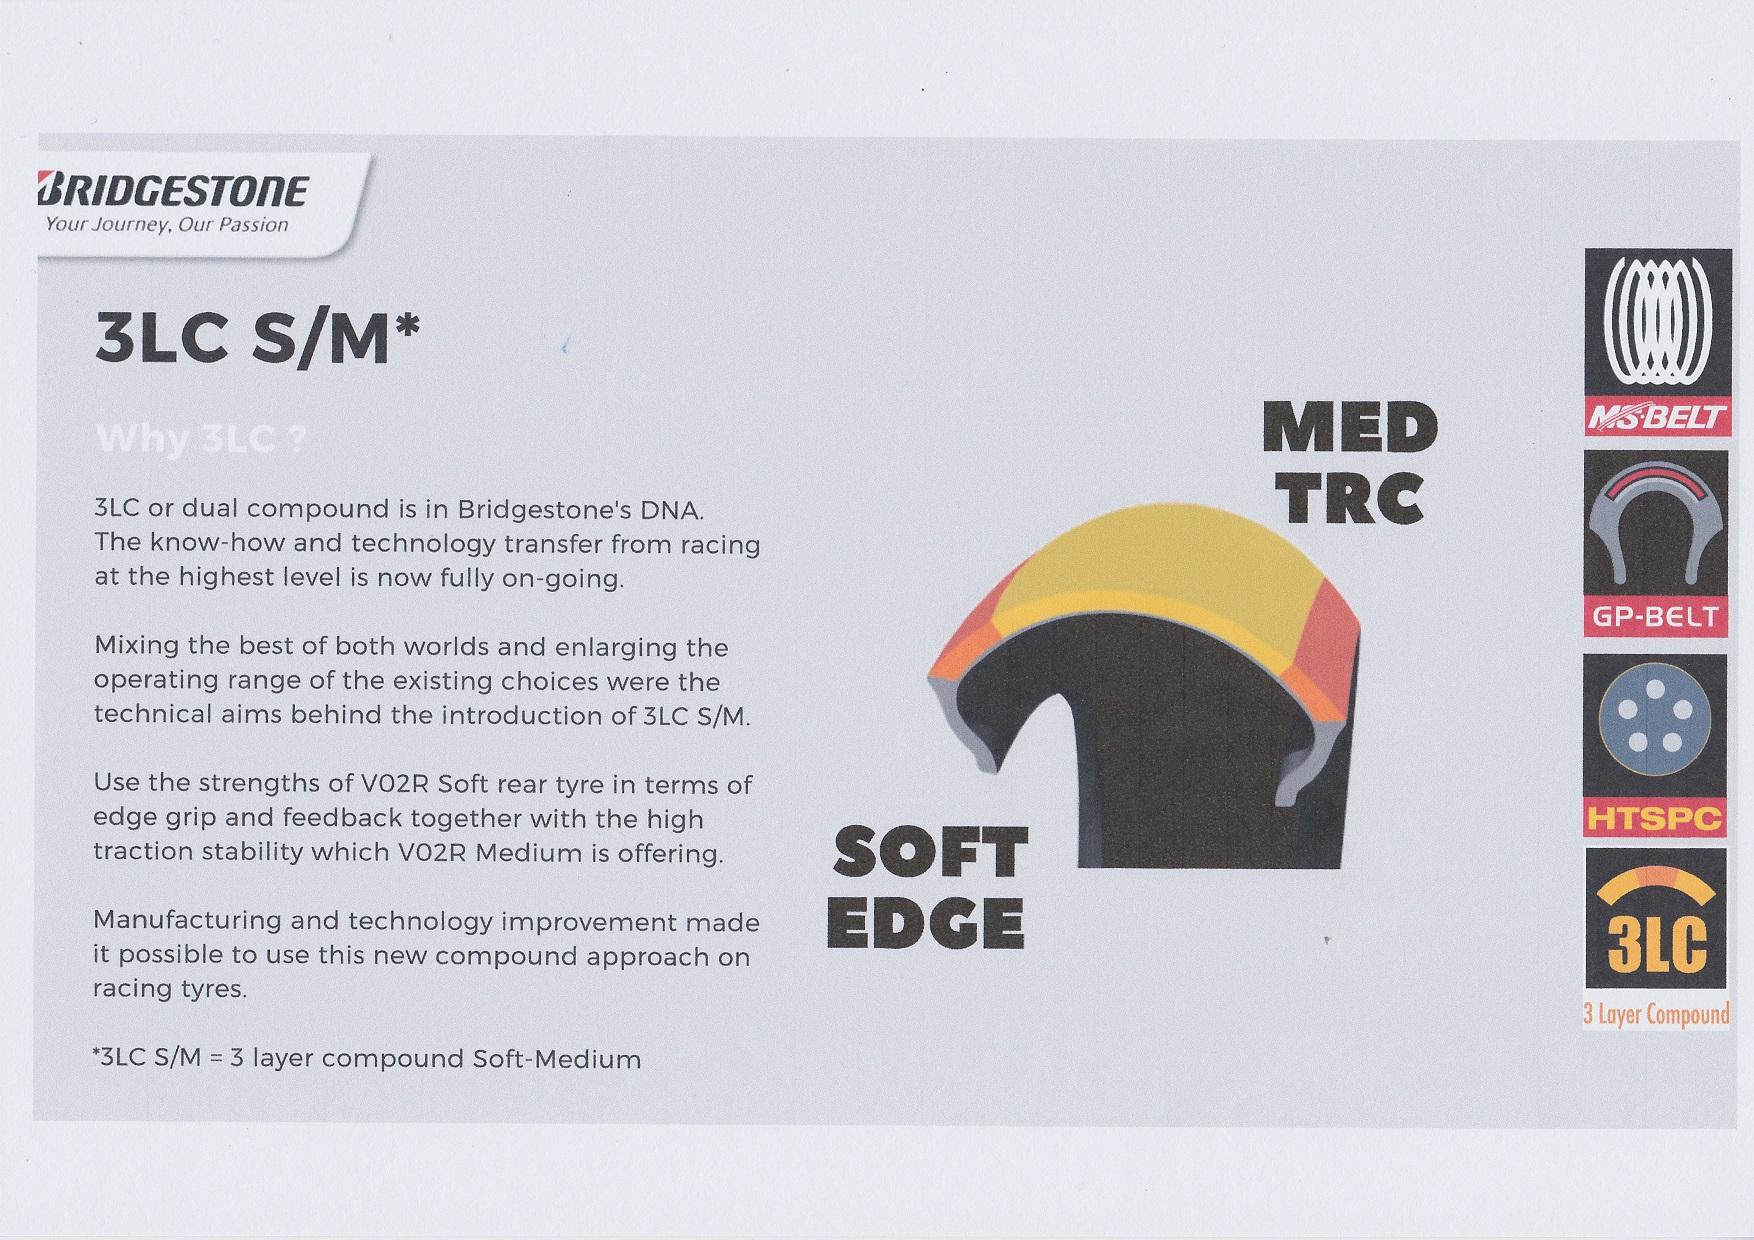 Motorrad-Racing Grün - Bridgestone Rennreifen Slick